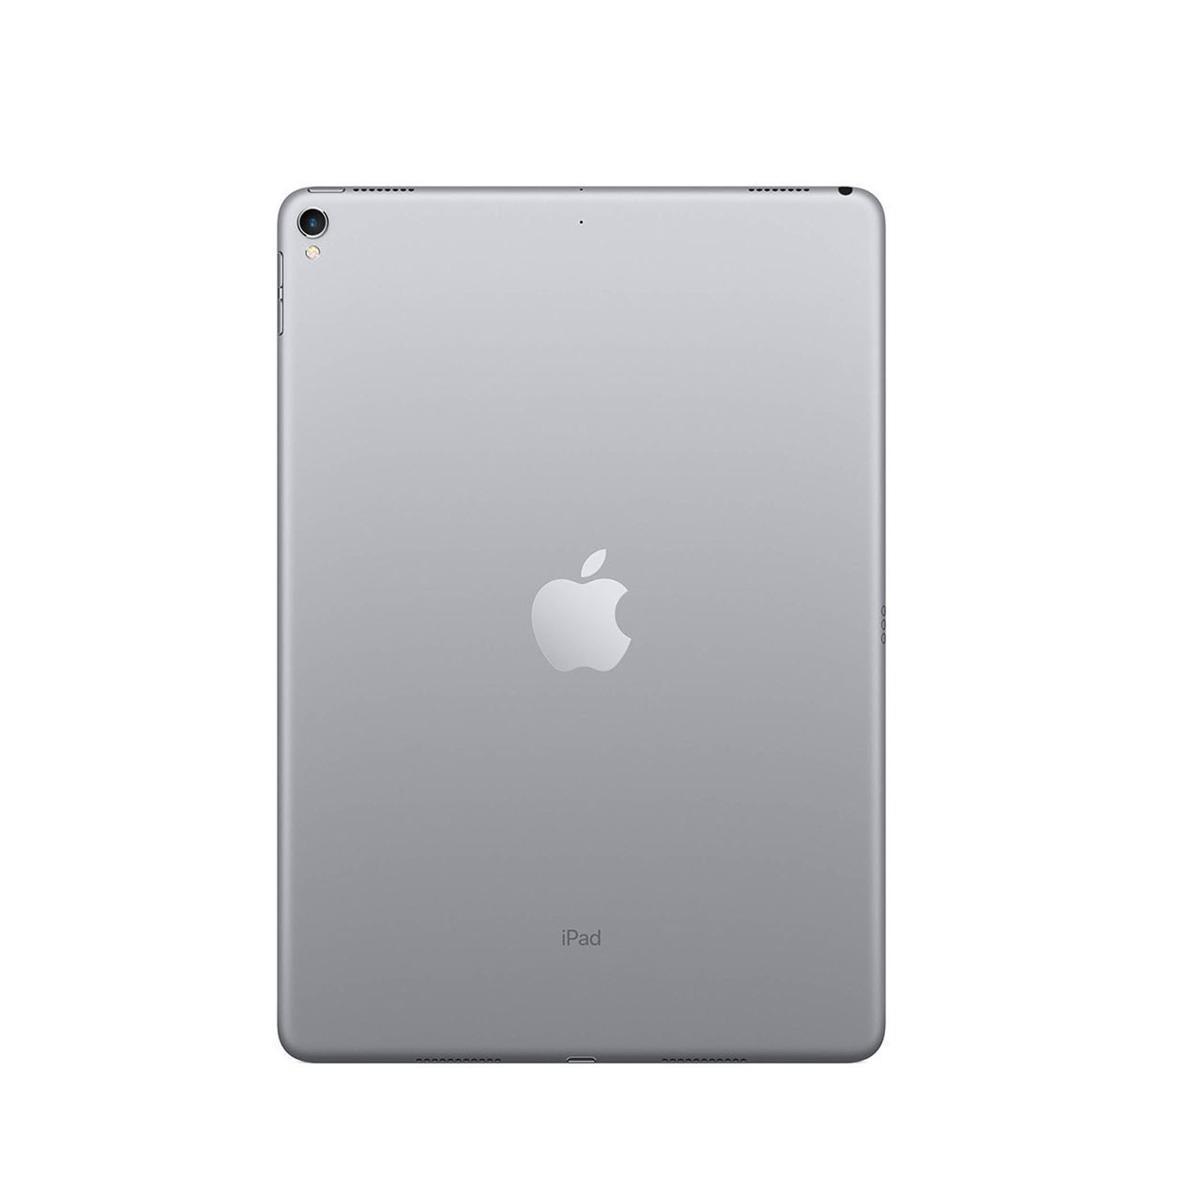 "iPad Pro 12,9"" (2015) - WLAN"